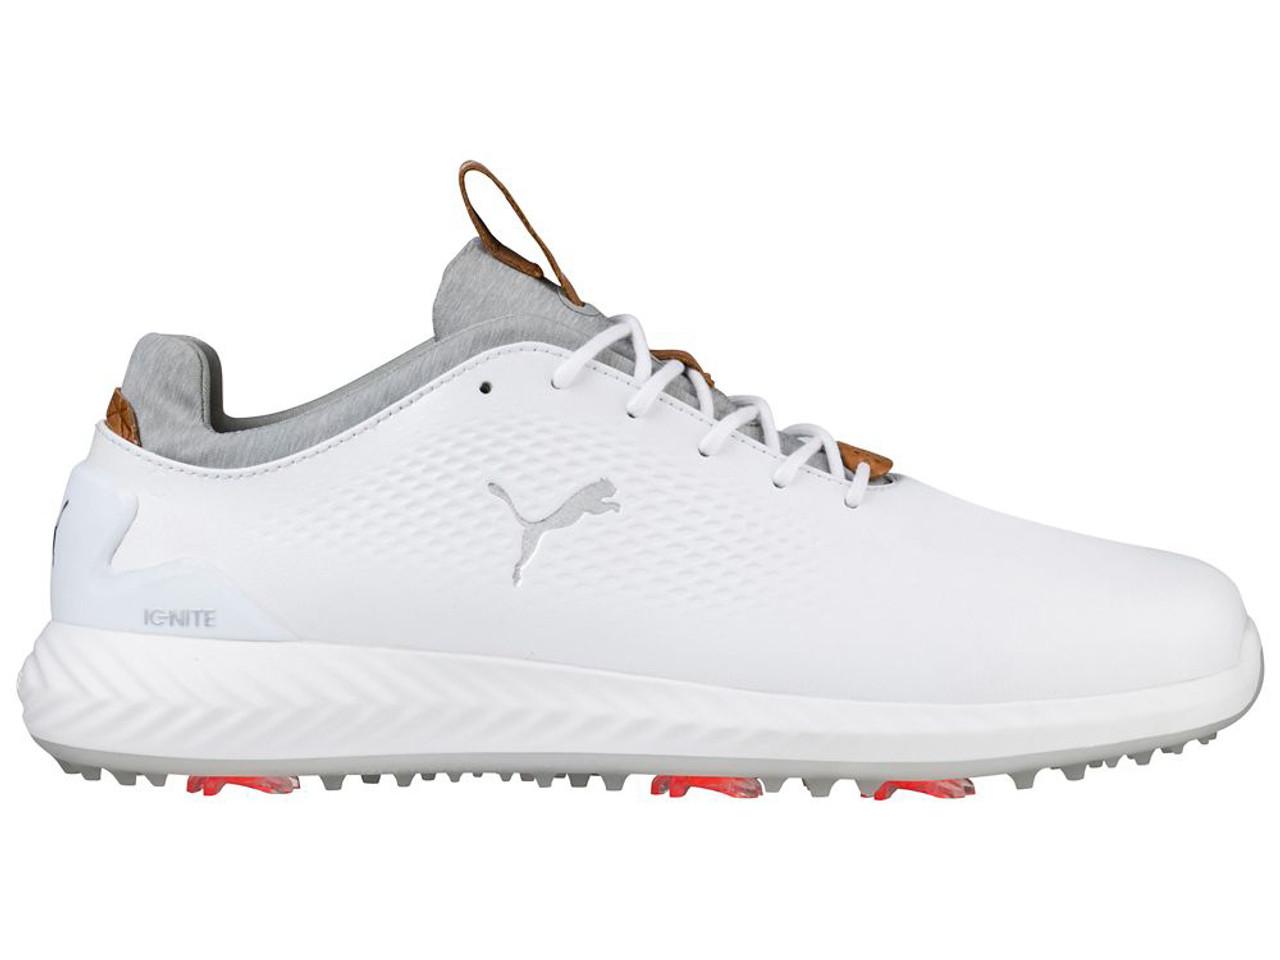 Puma Ignite PWRadapt Leather Shoes - White - Mens For Sale  fe929c0cb